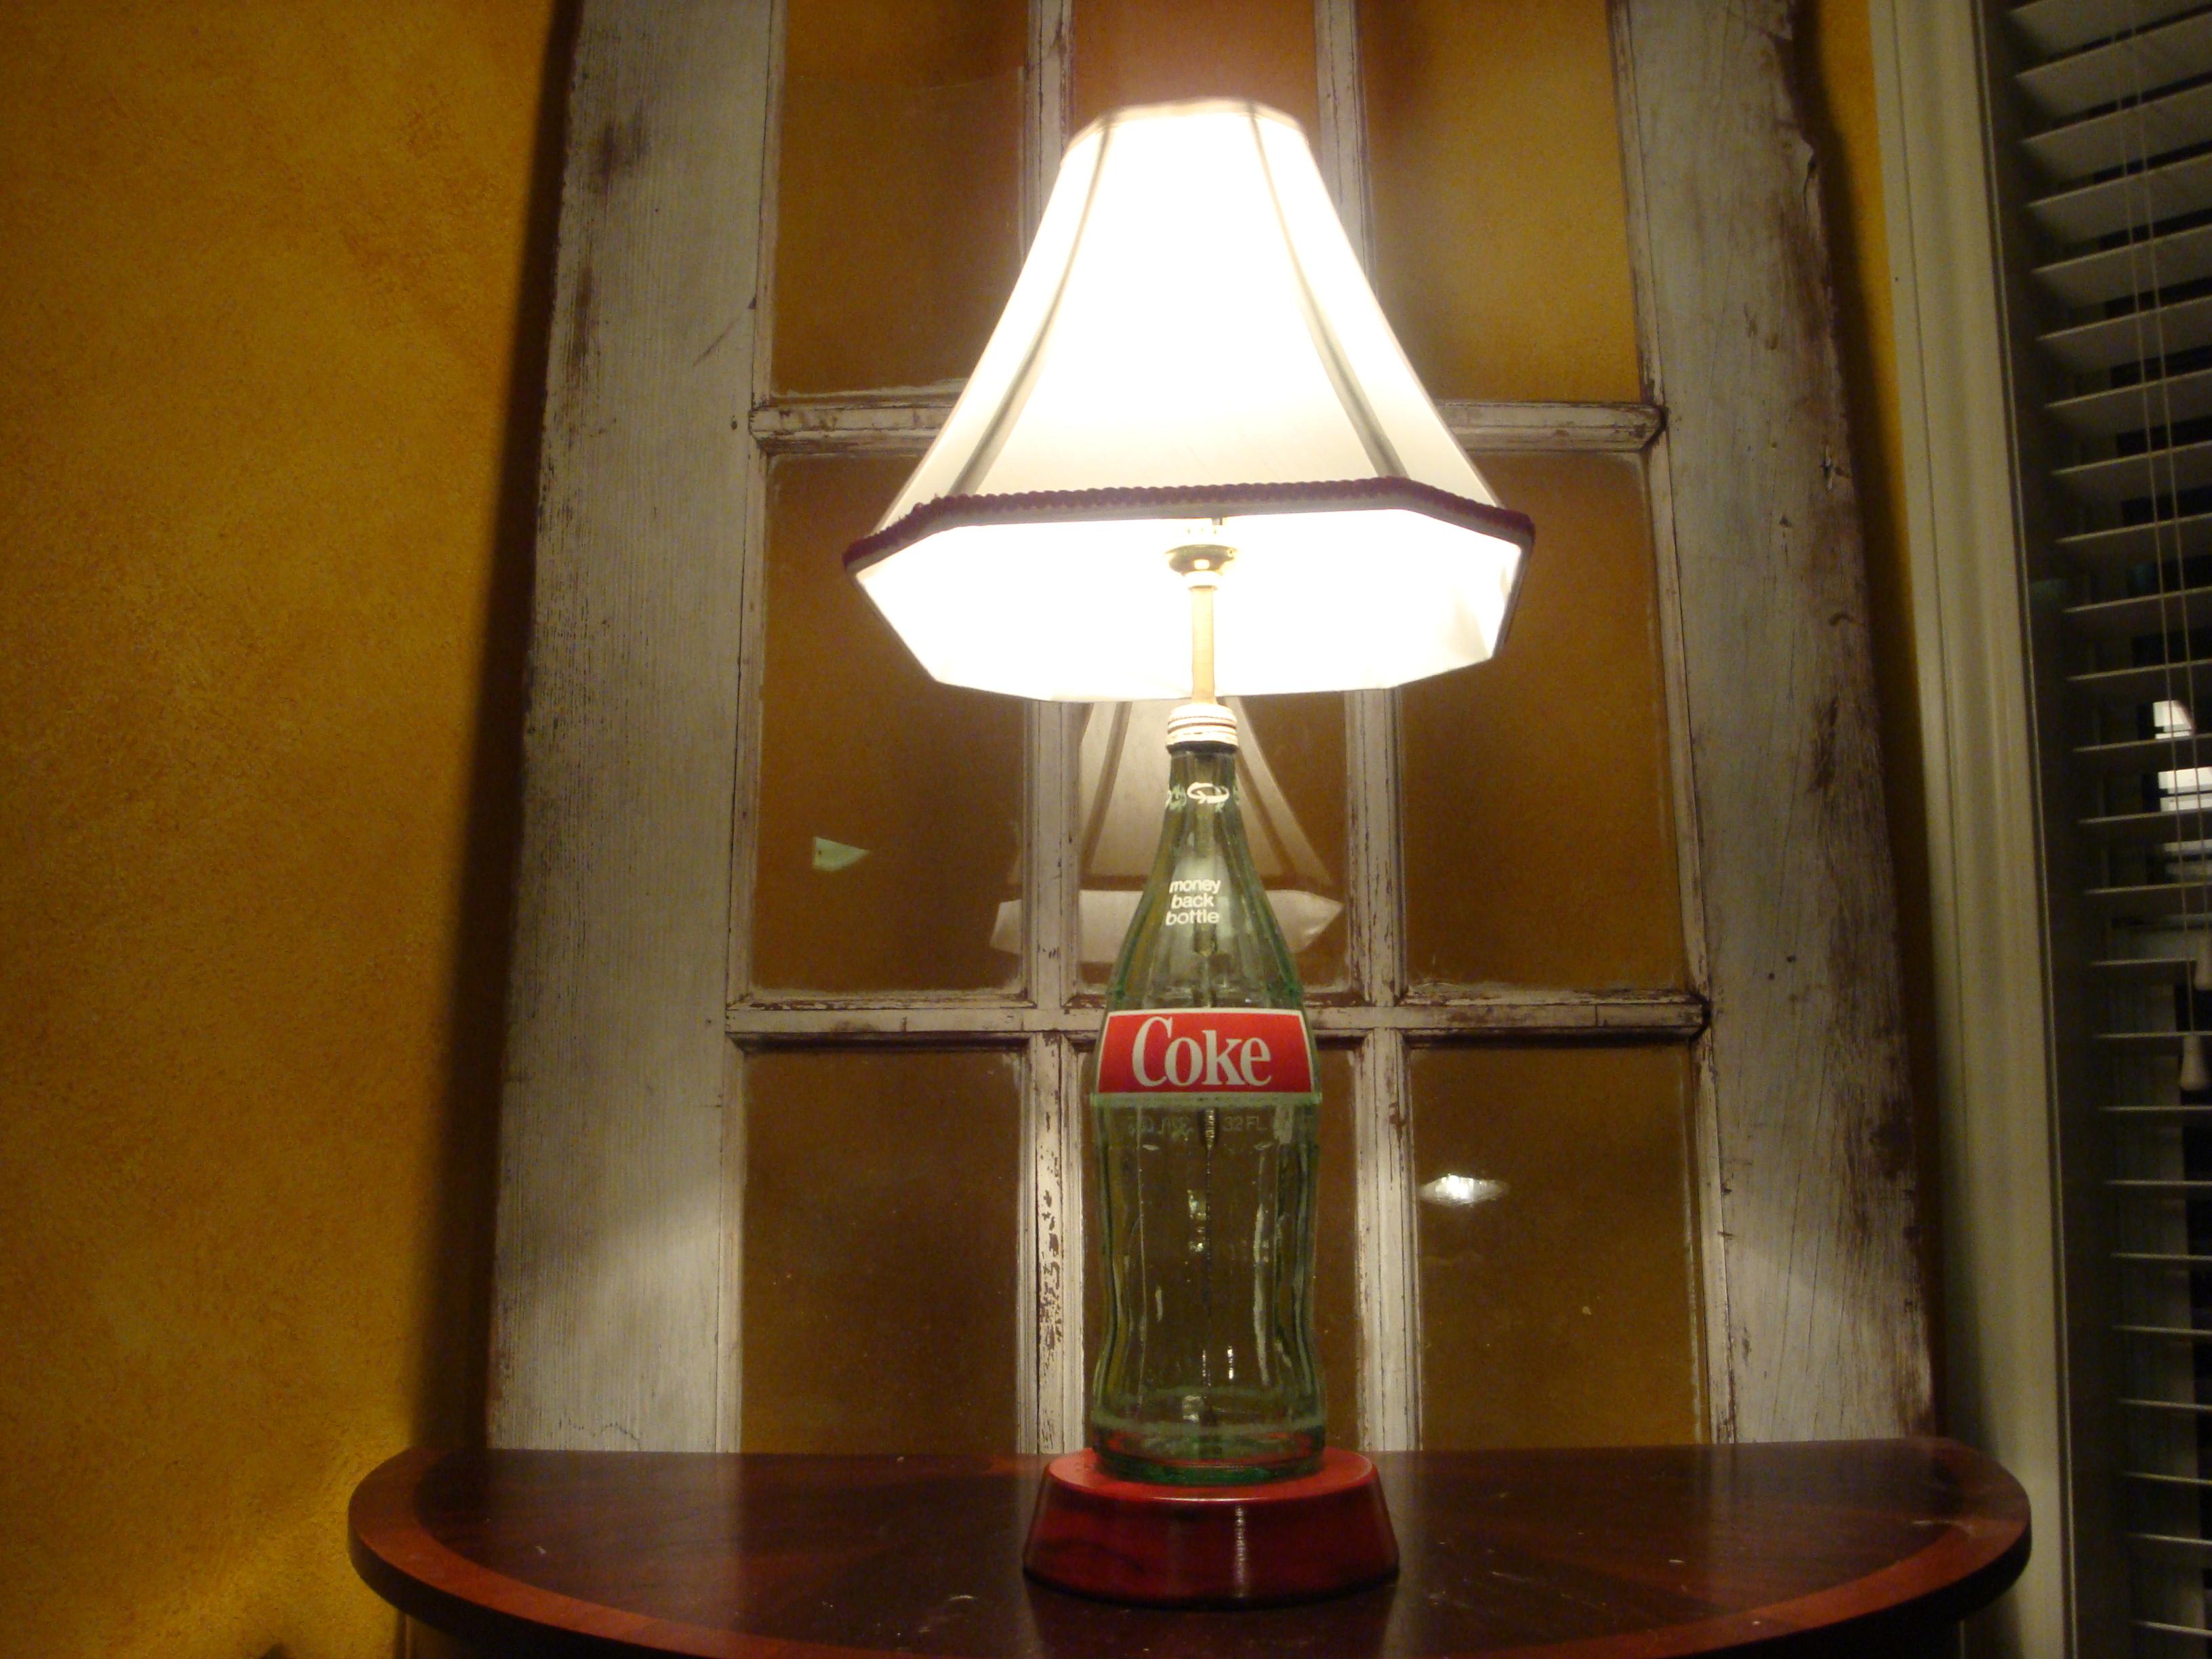 coke lamp photo - 1